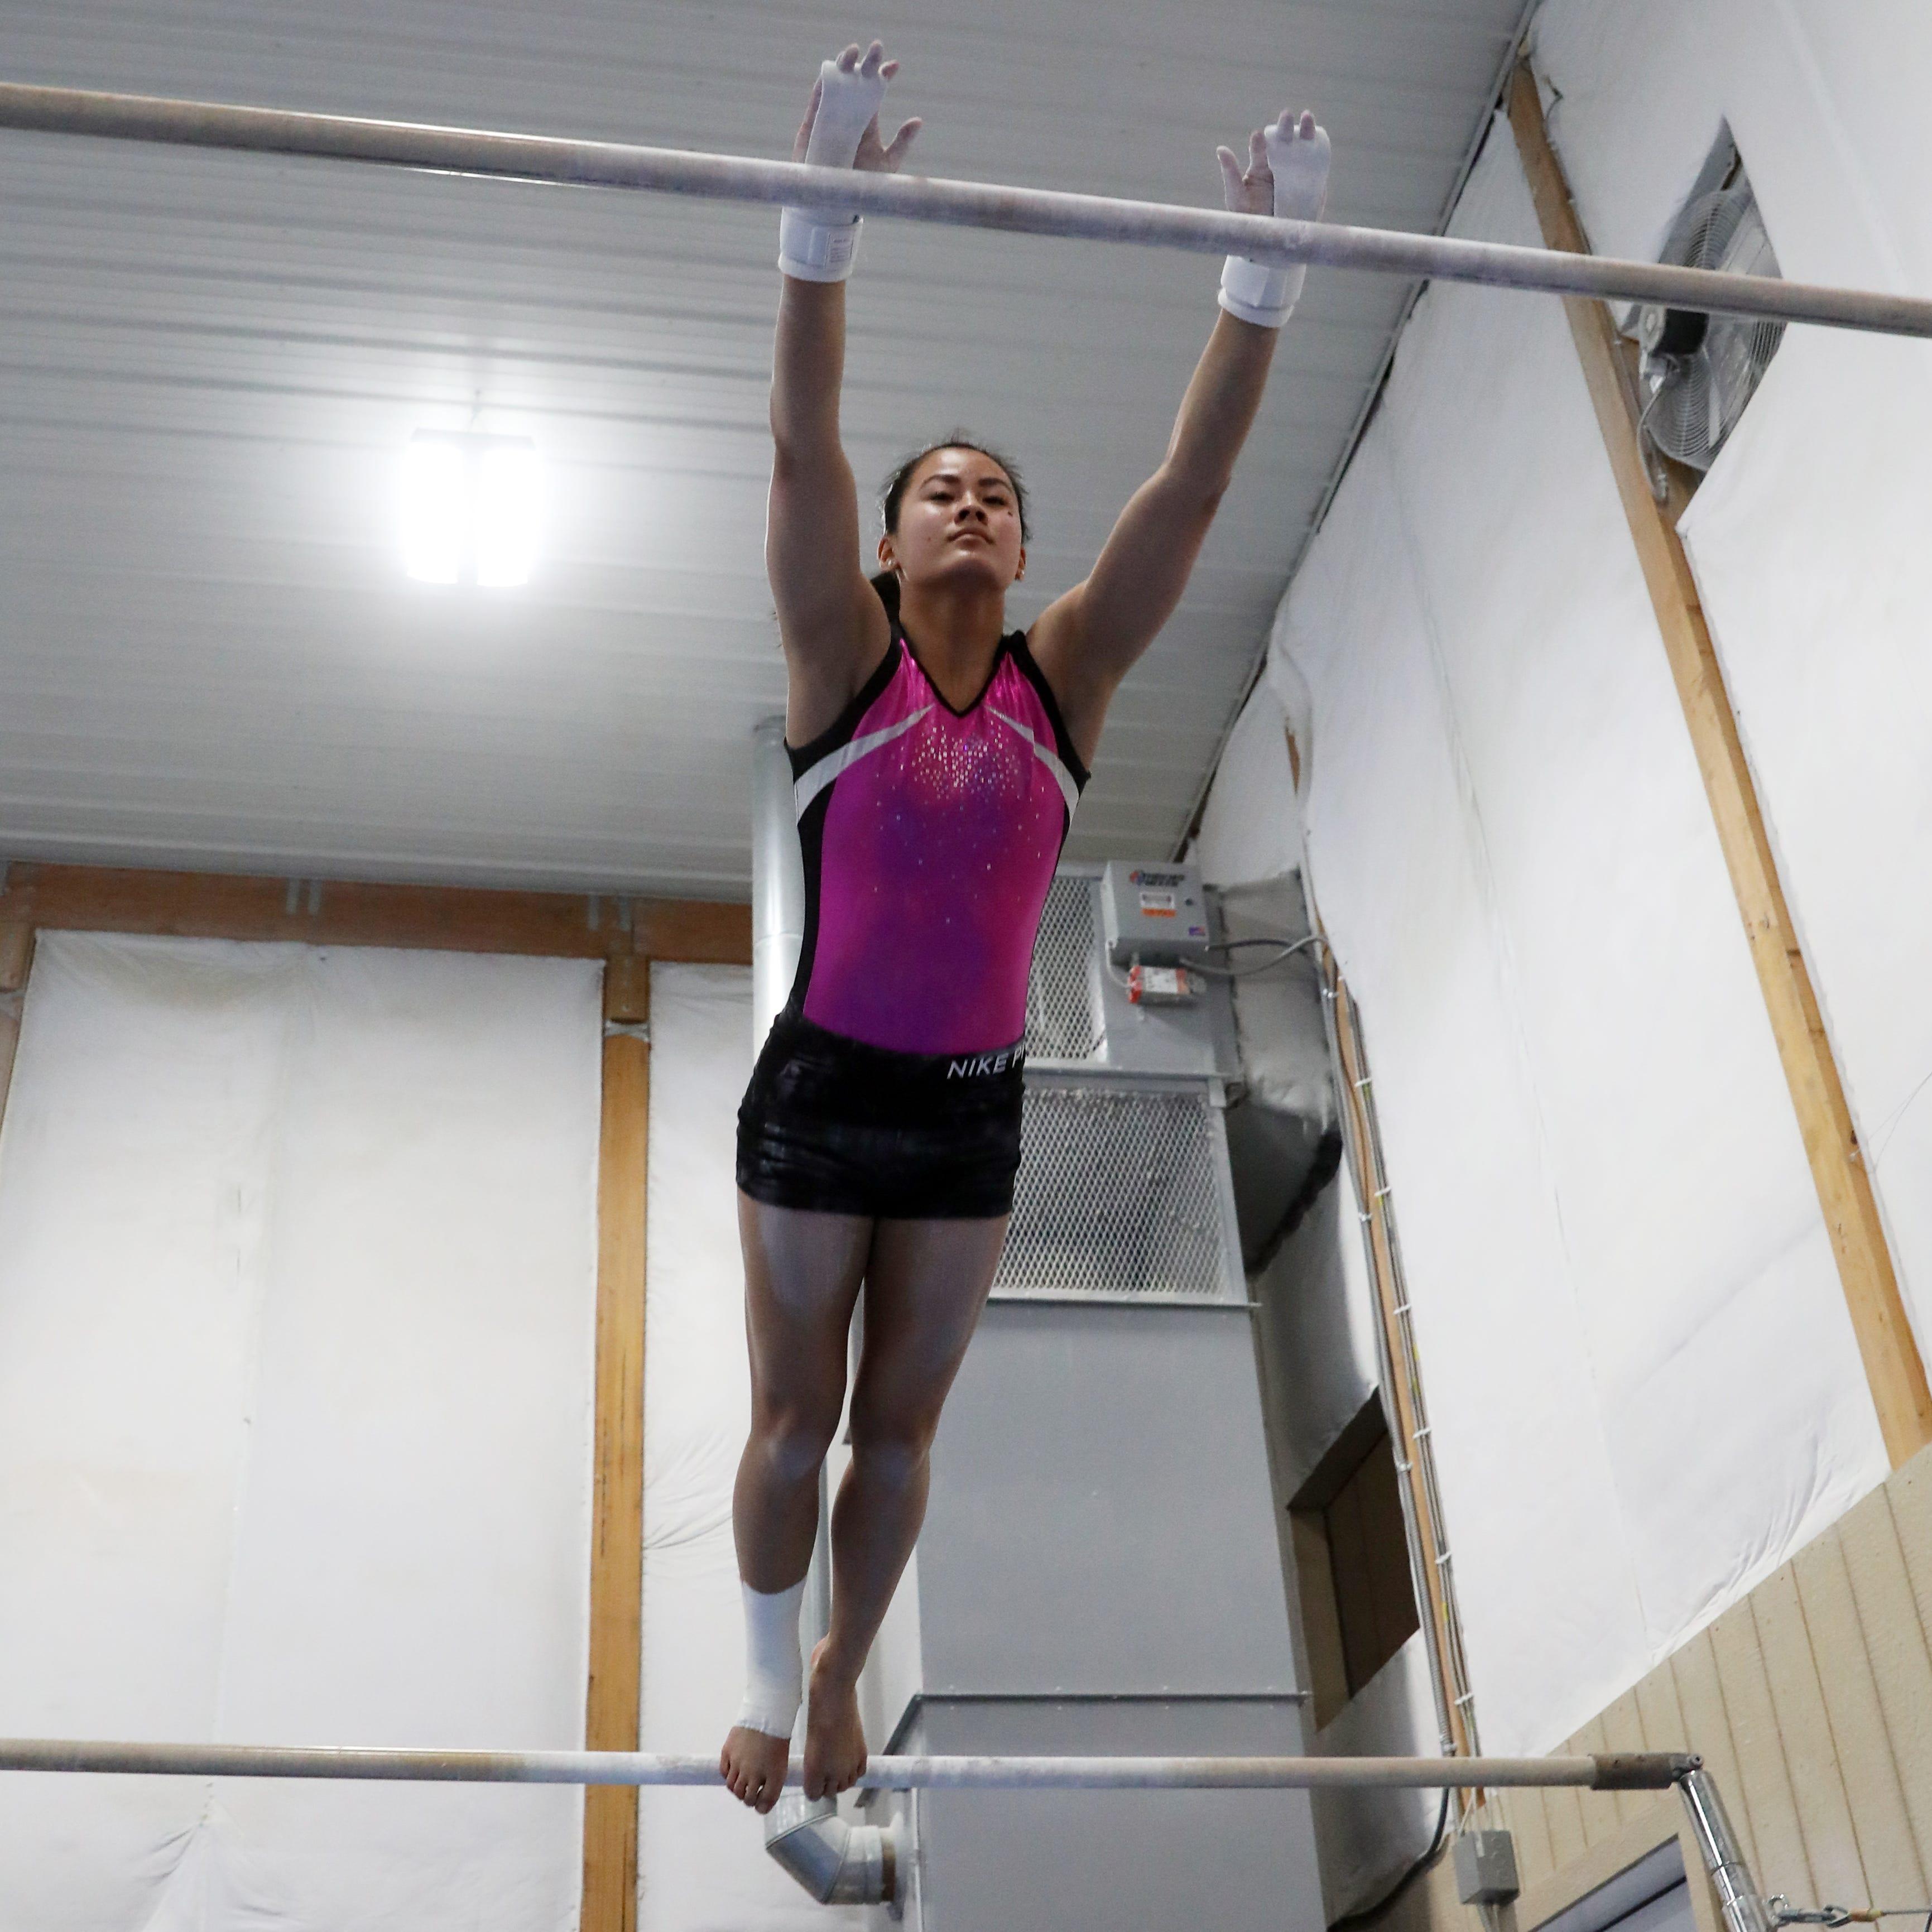 Ridgewood gymnast never wavers against adversity